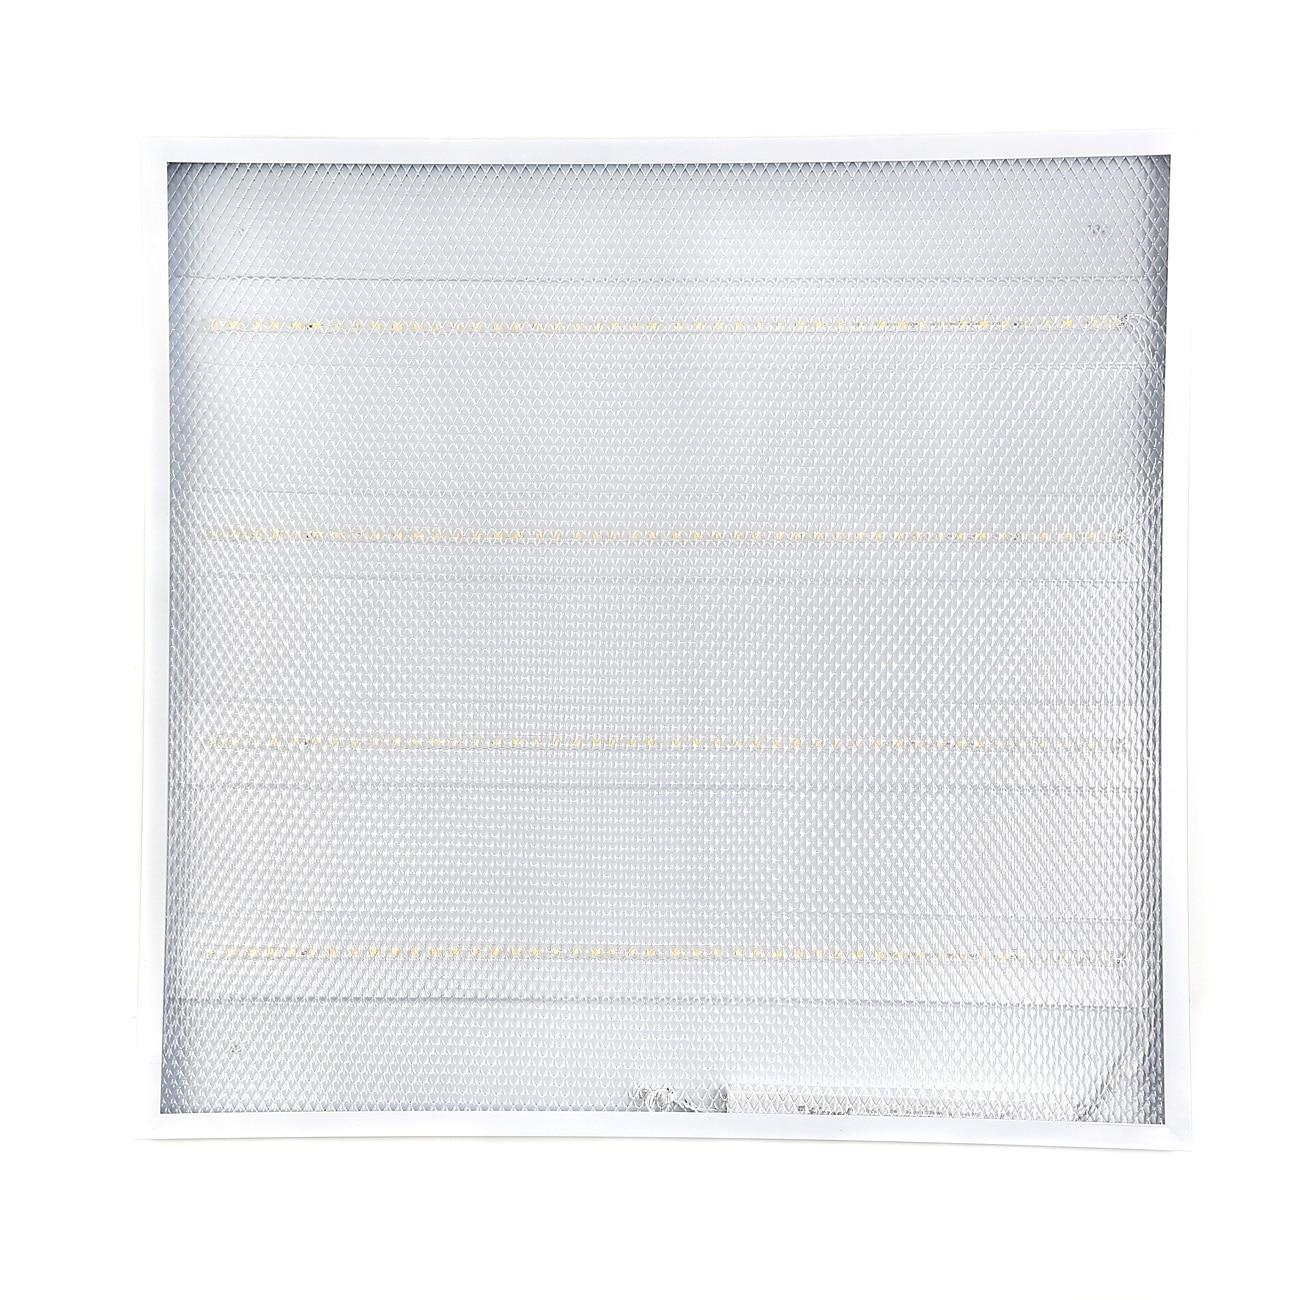 LED панели и растровые светильники - Led prismatic 36Вт Lezard 6400К 000001142 - Фото 3